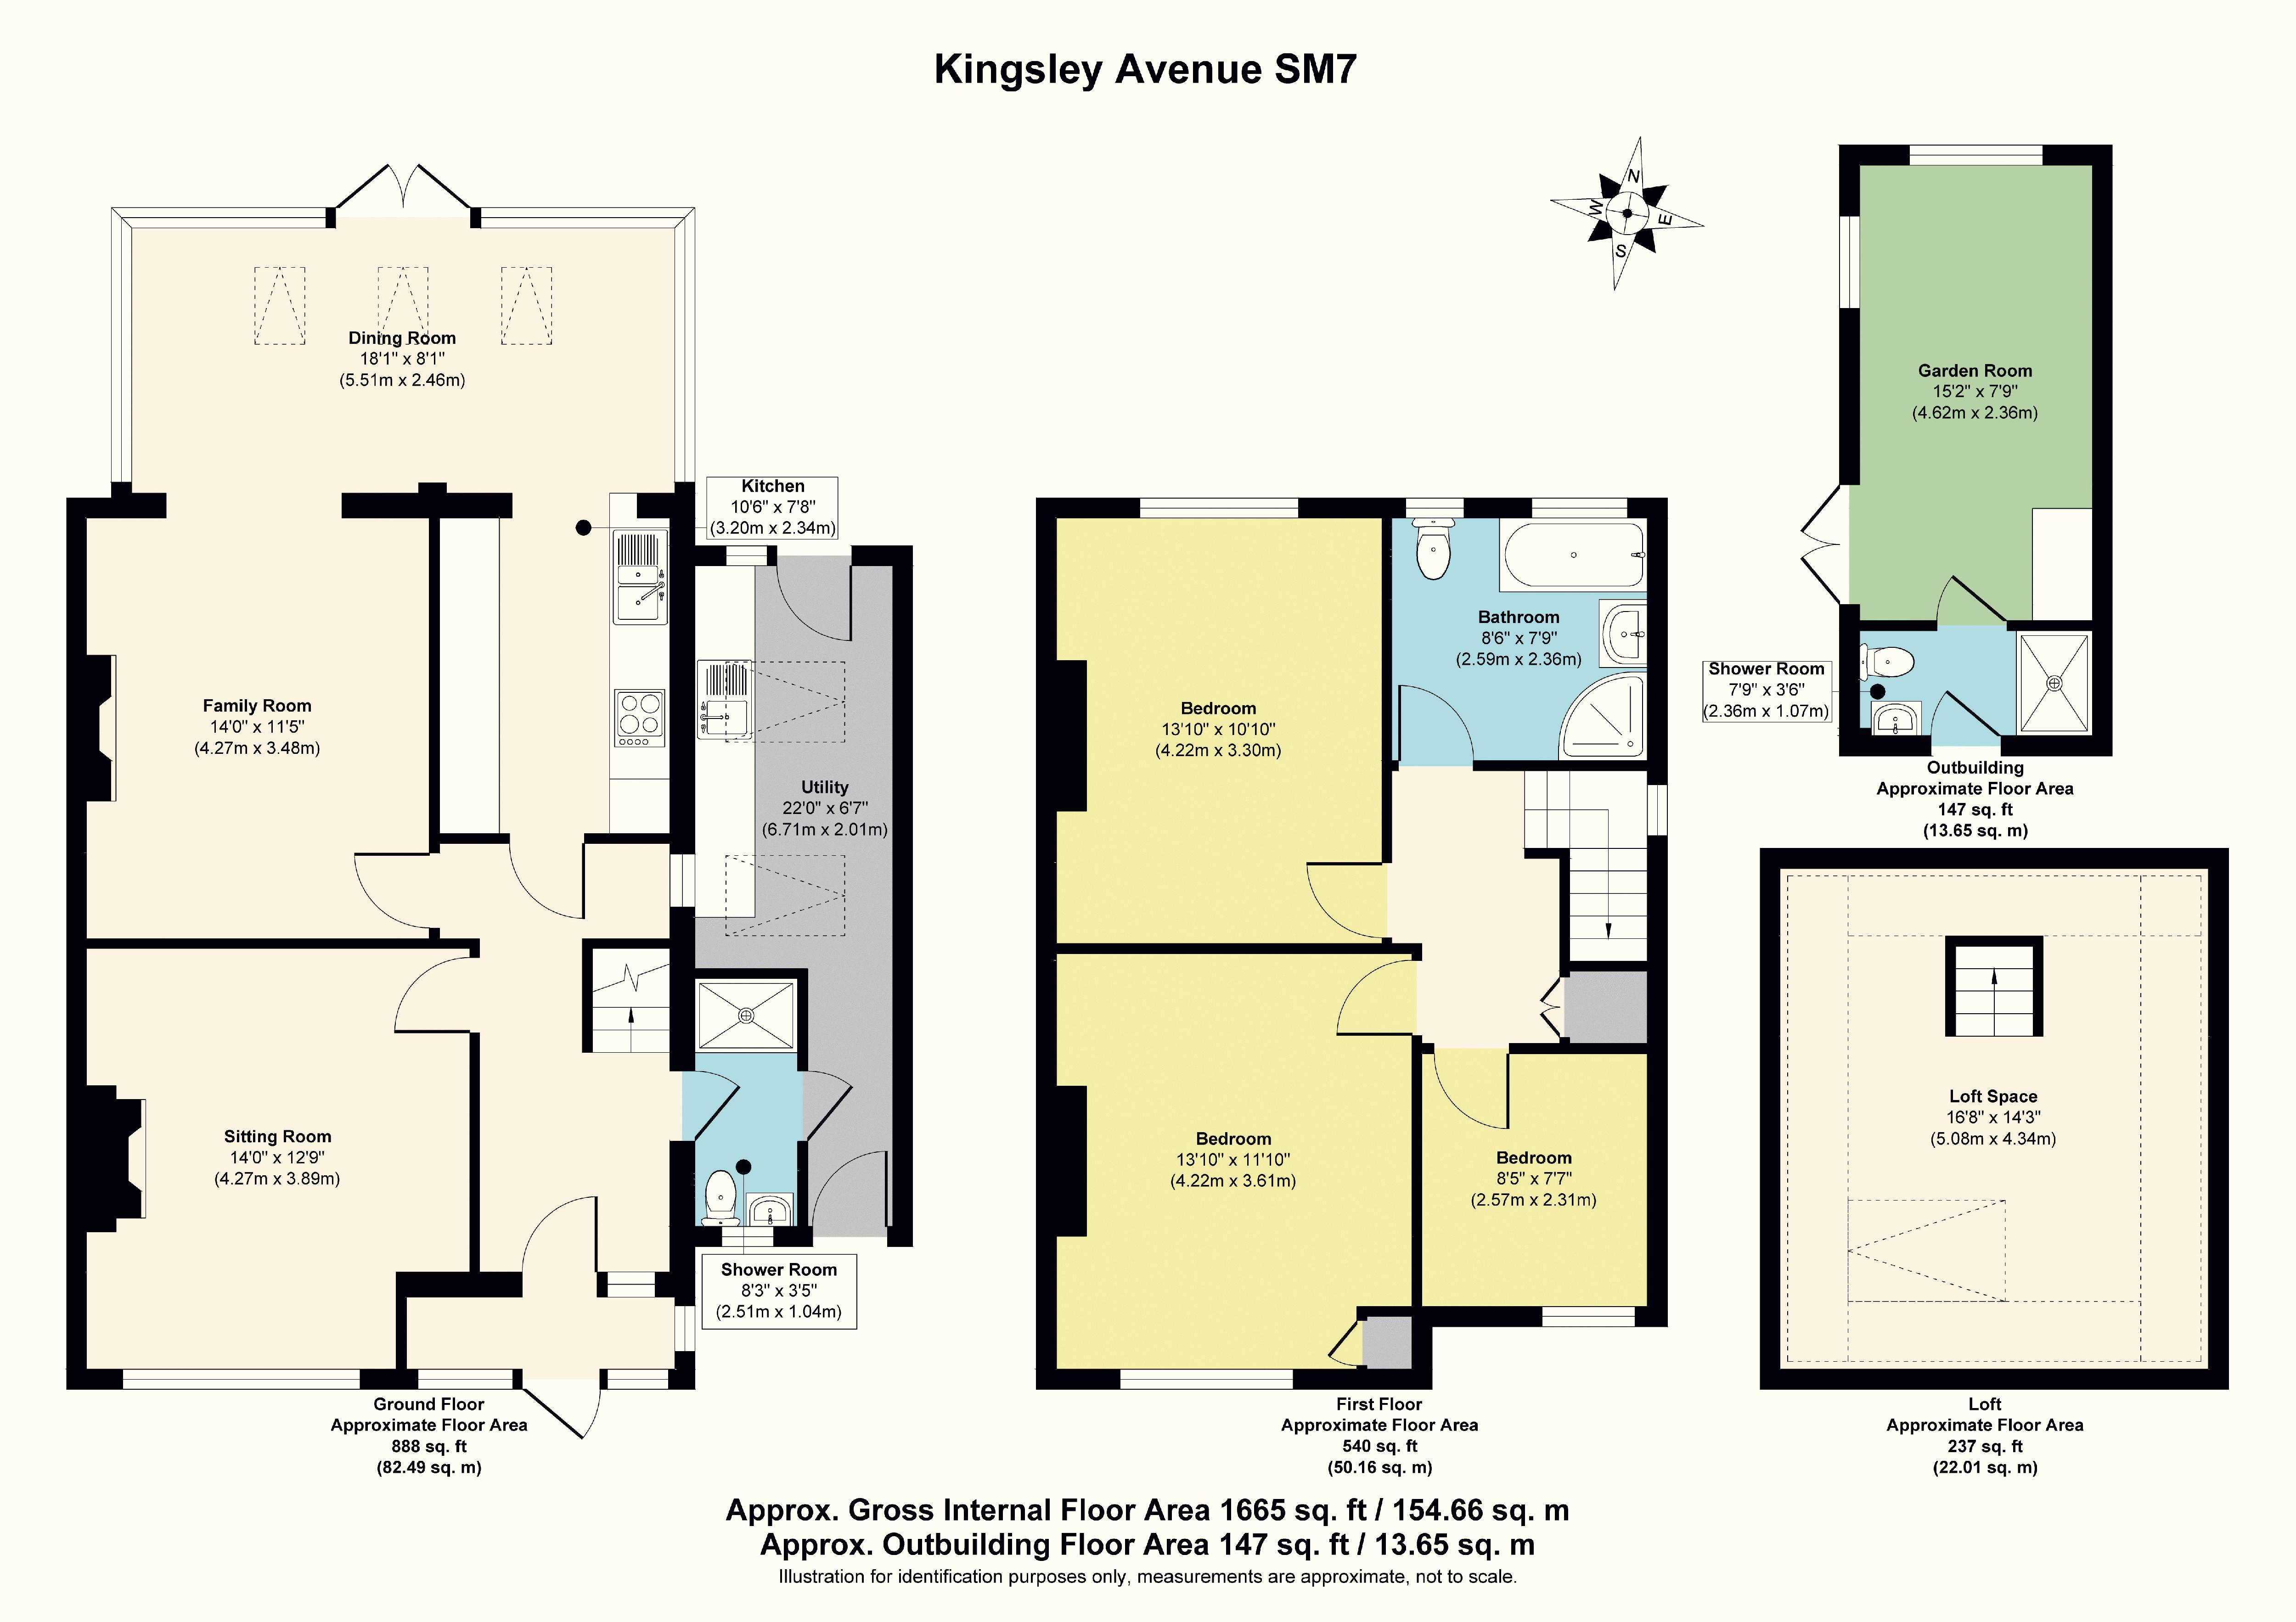 Kingsley Avenue